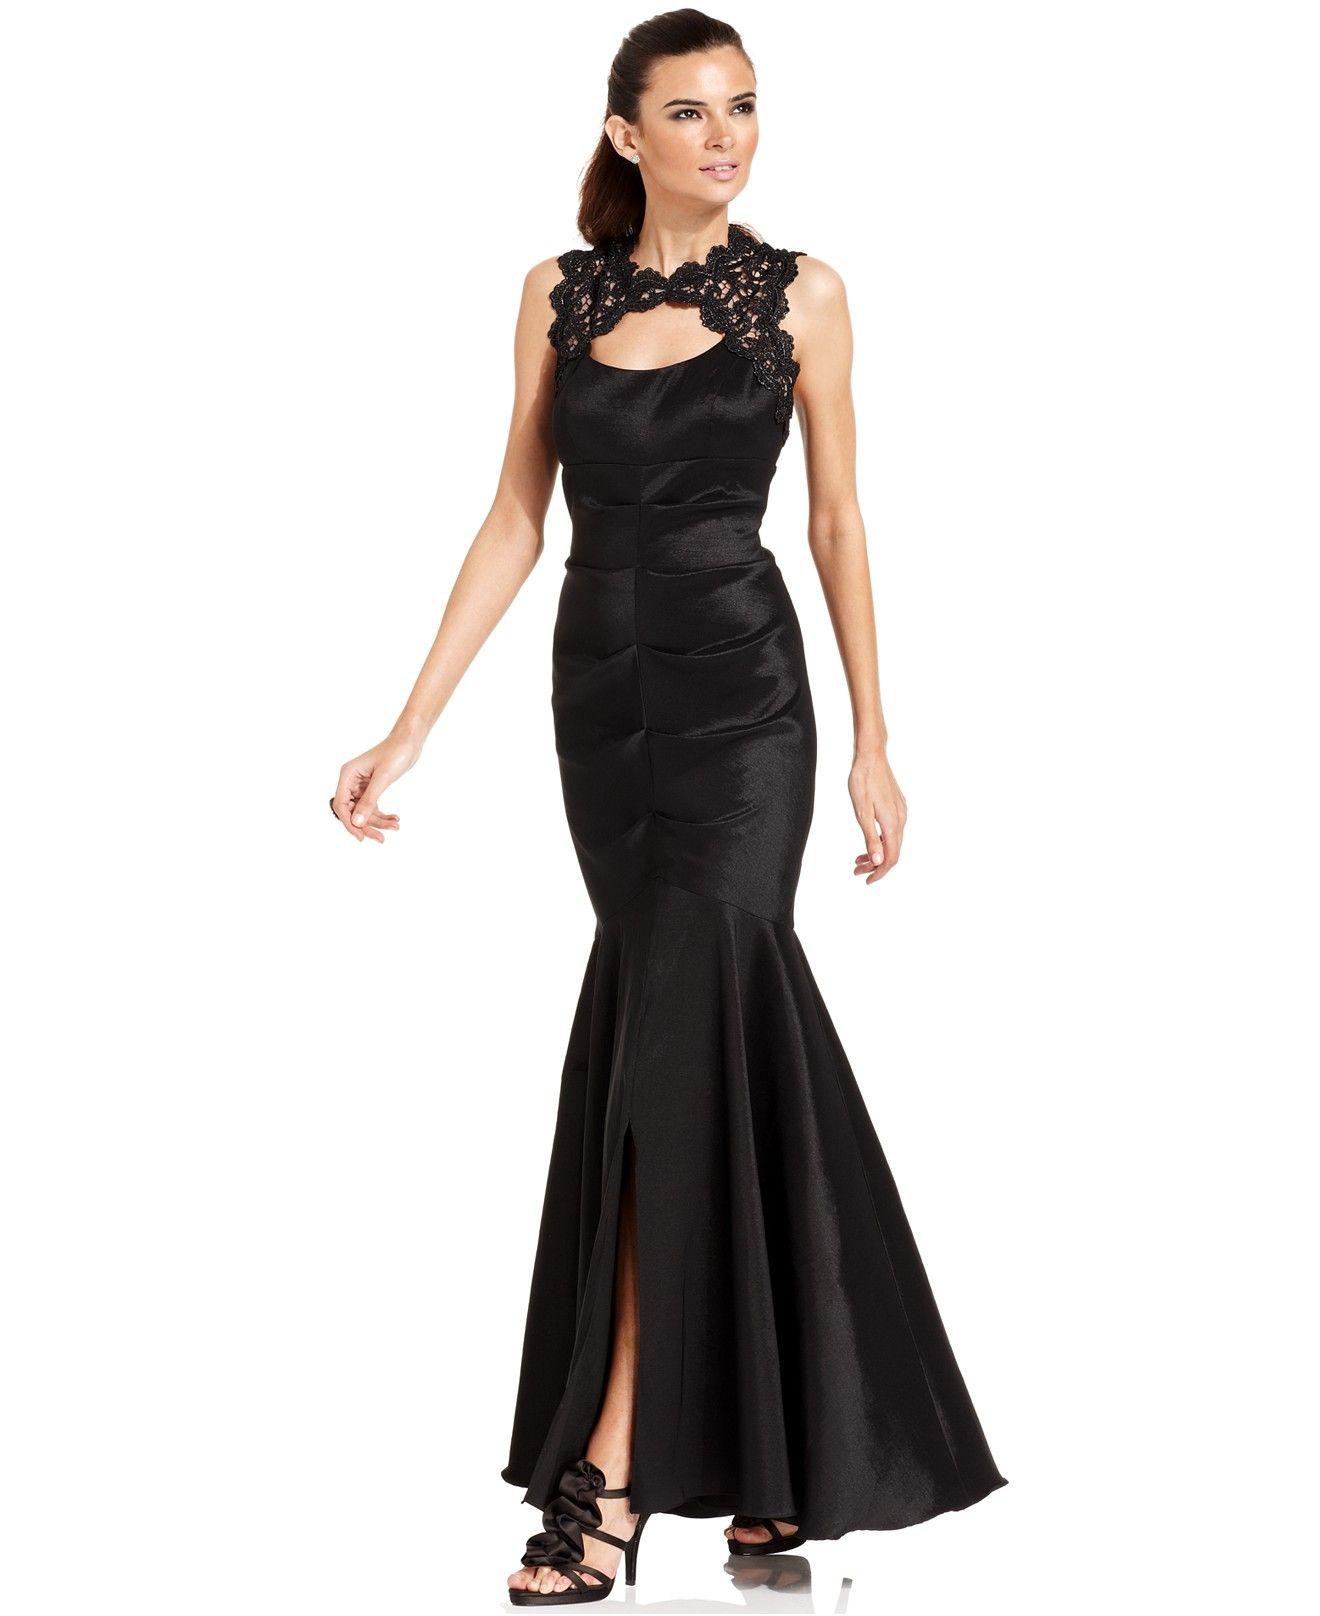 c55dc3d7faf6 Xscape Sleeveless Glitter Lace Mermaid Gown - Dresses - Women - Macy's